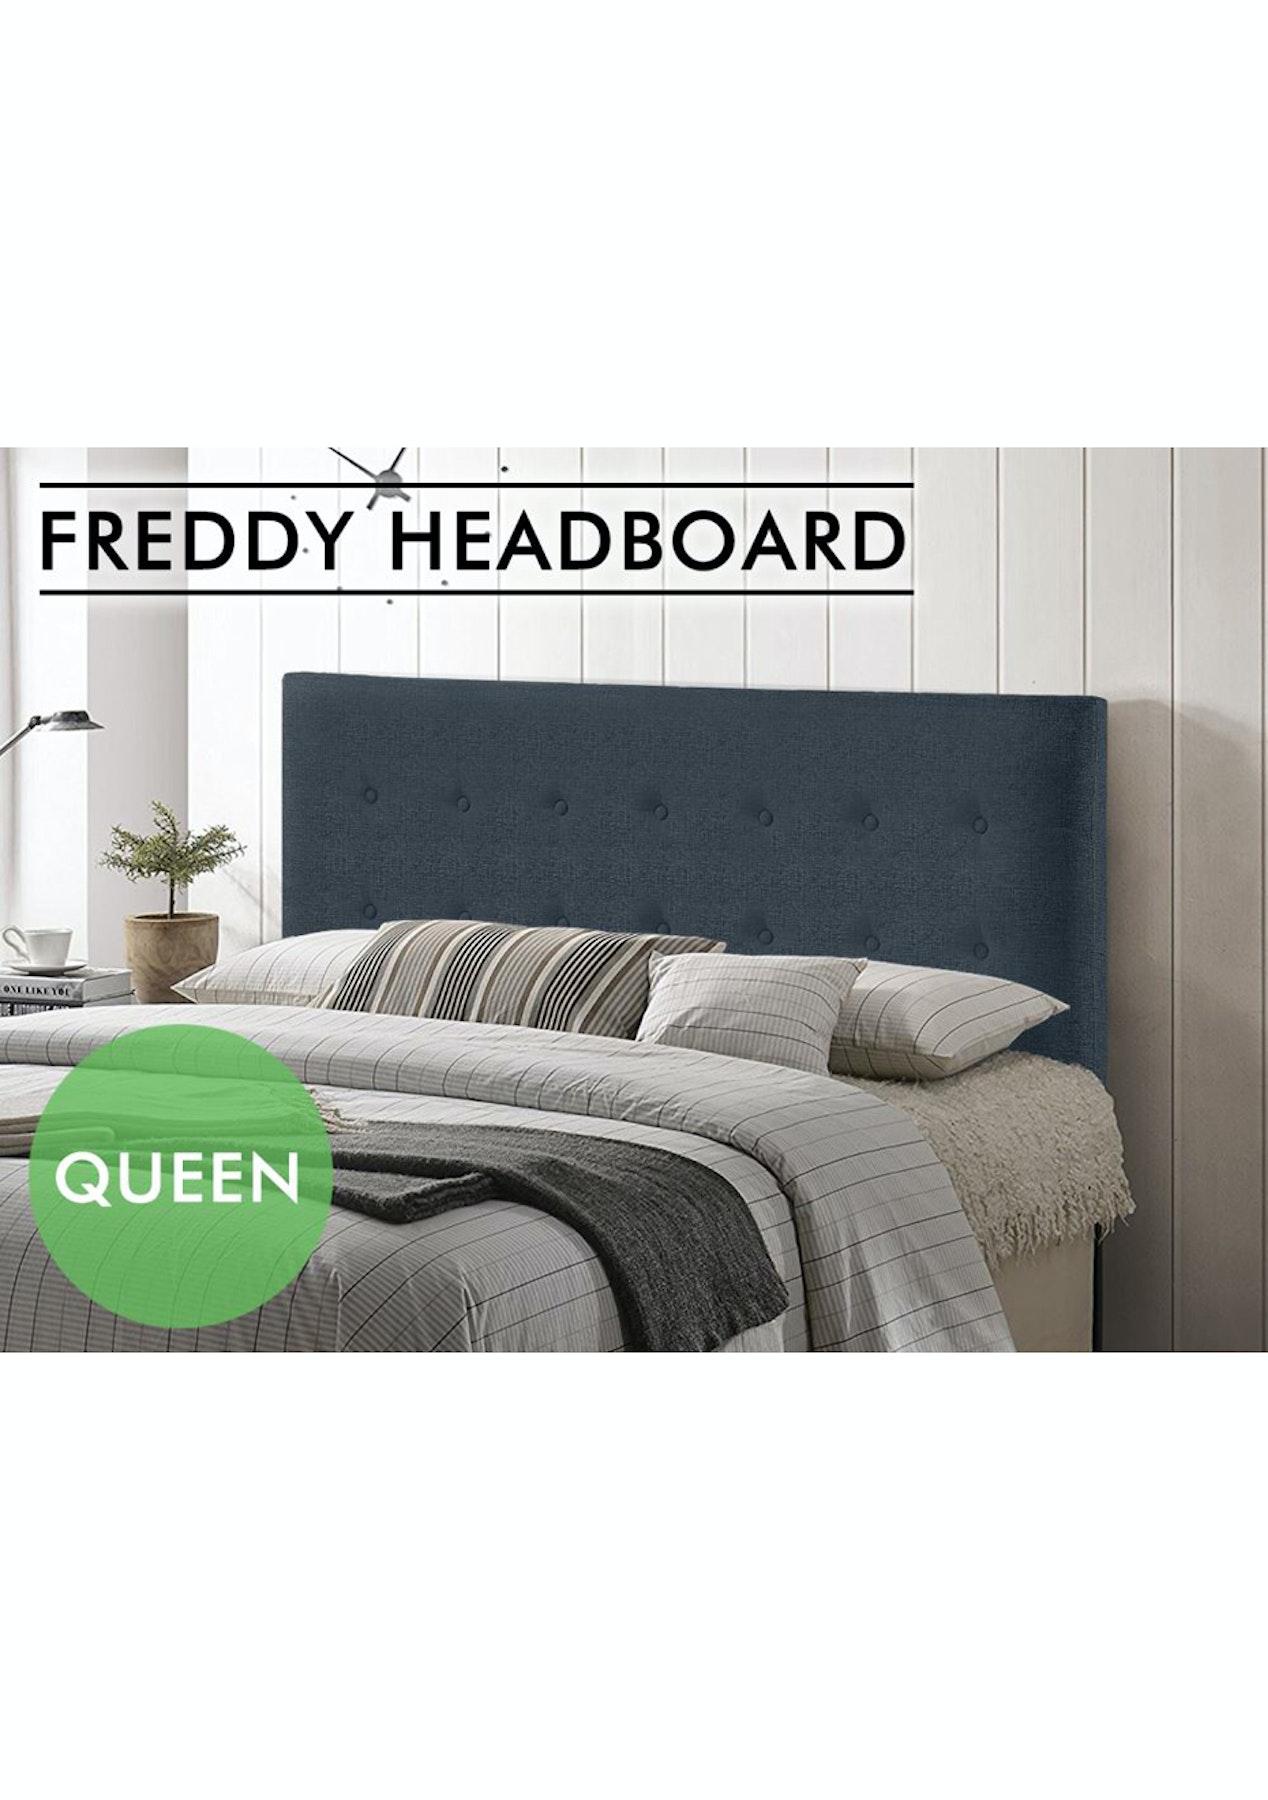 huge discount ea1ad a227e Freddy Headboard Queen